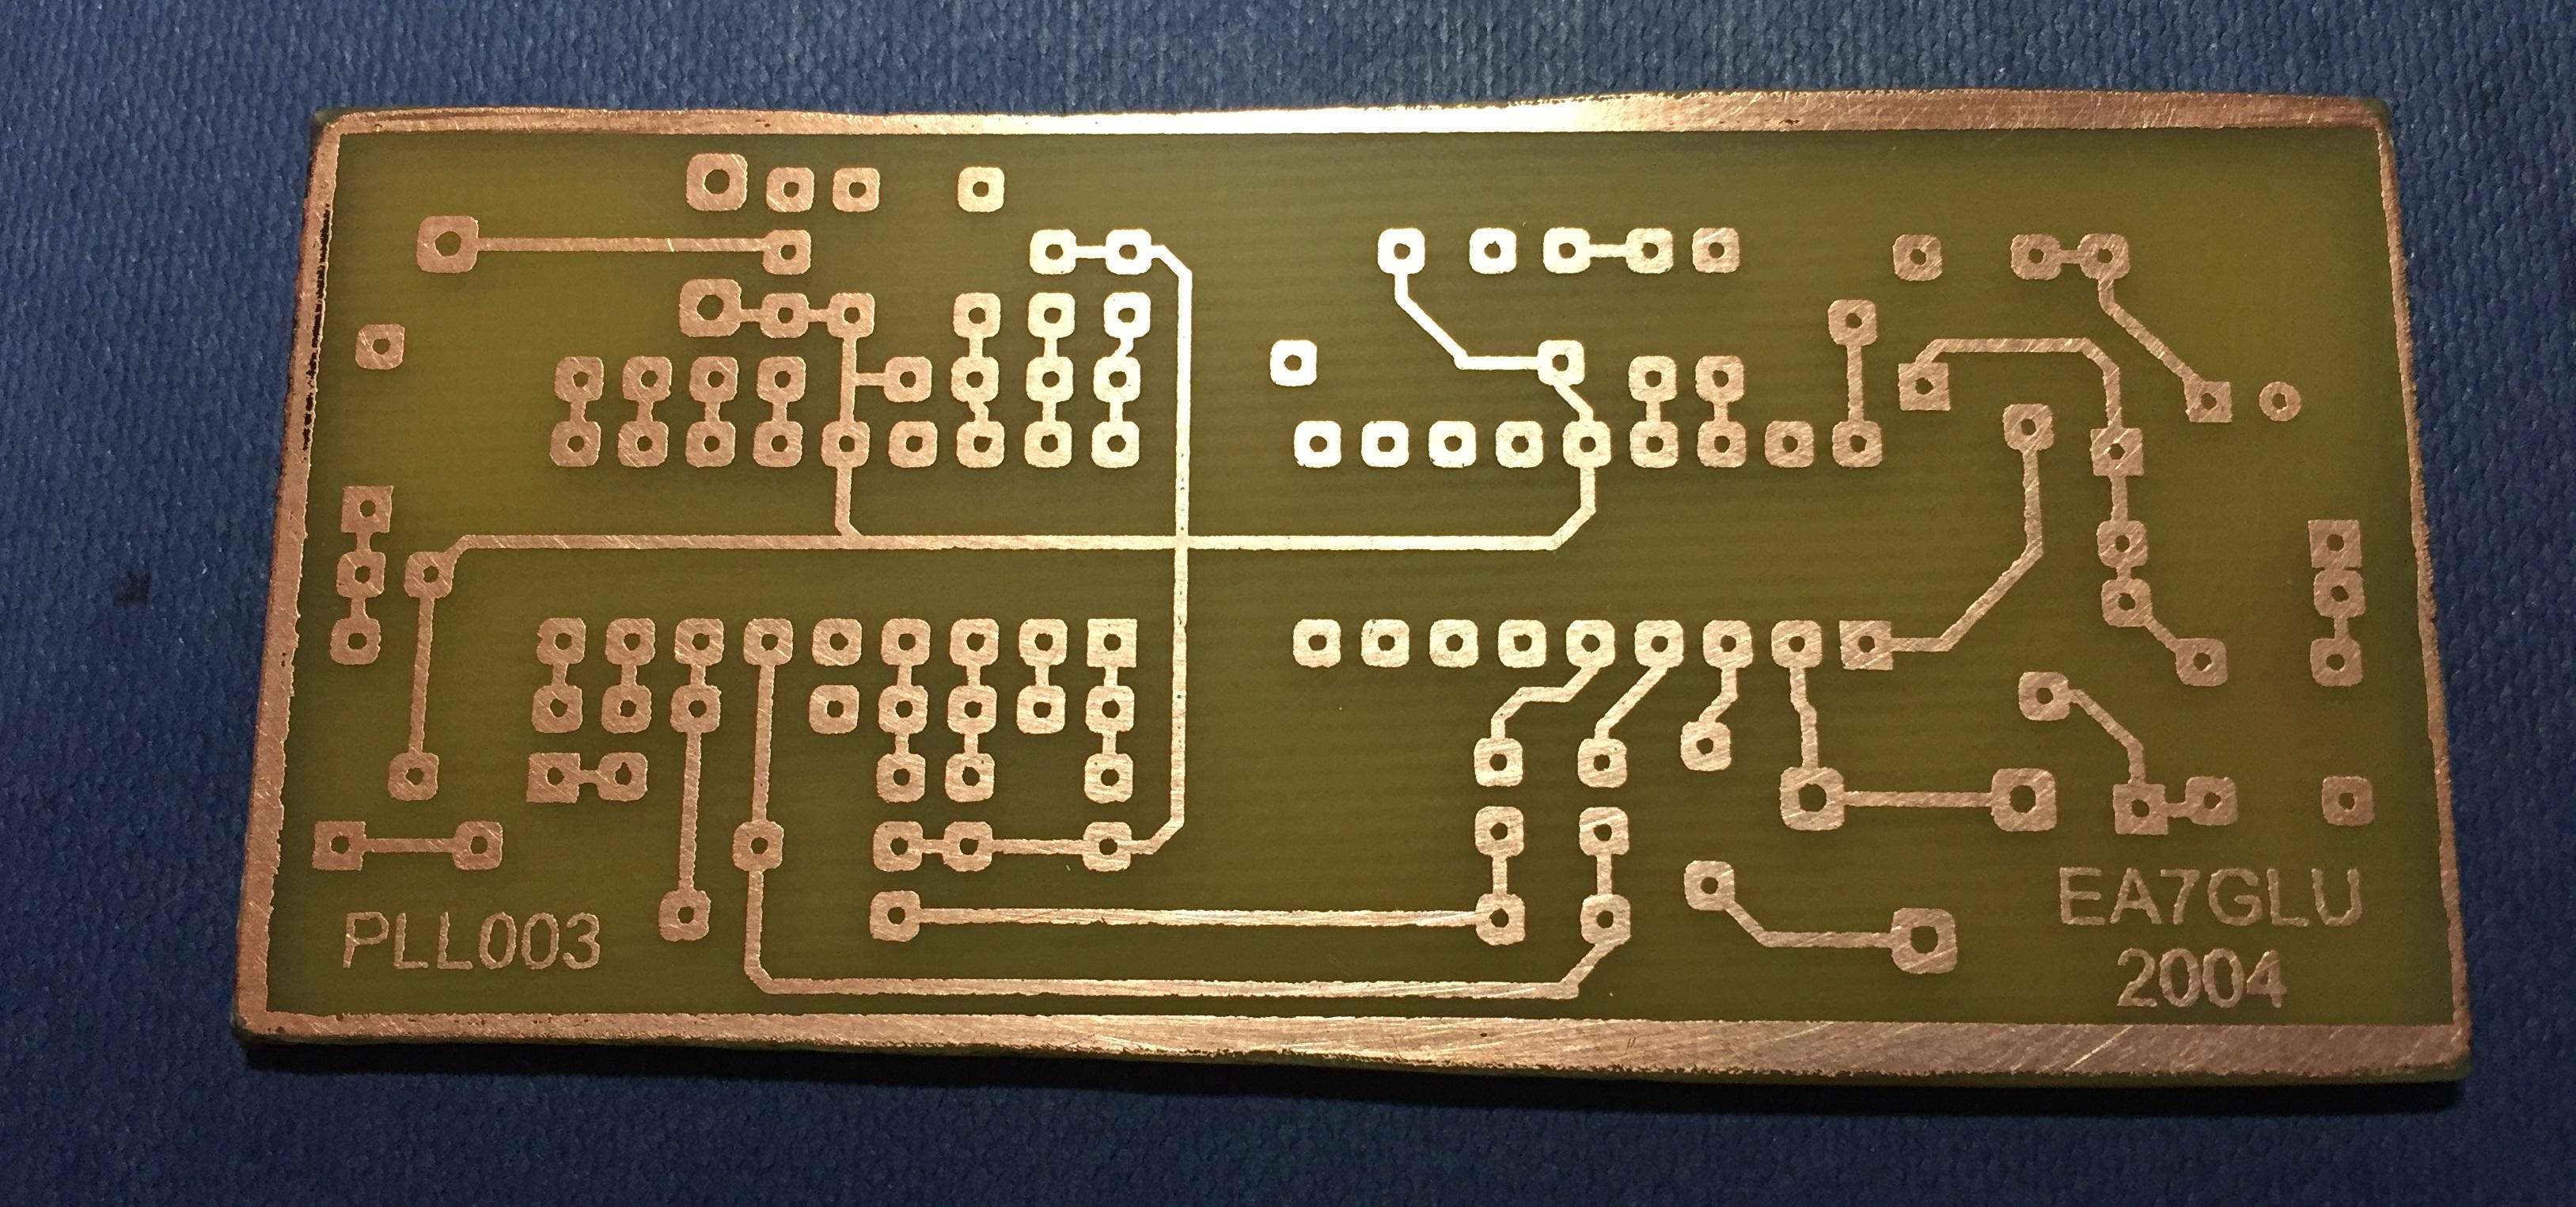 Circuito Impreso : Web ea glu circuitos impresos caseros